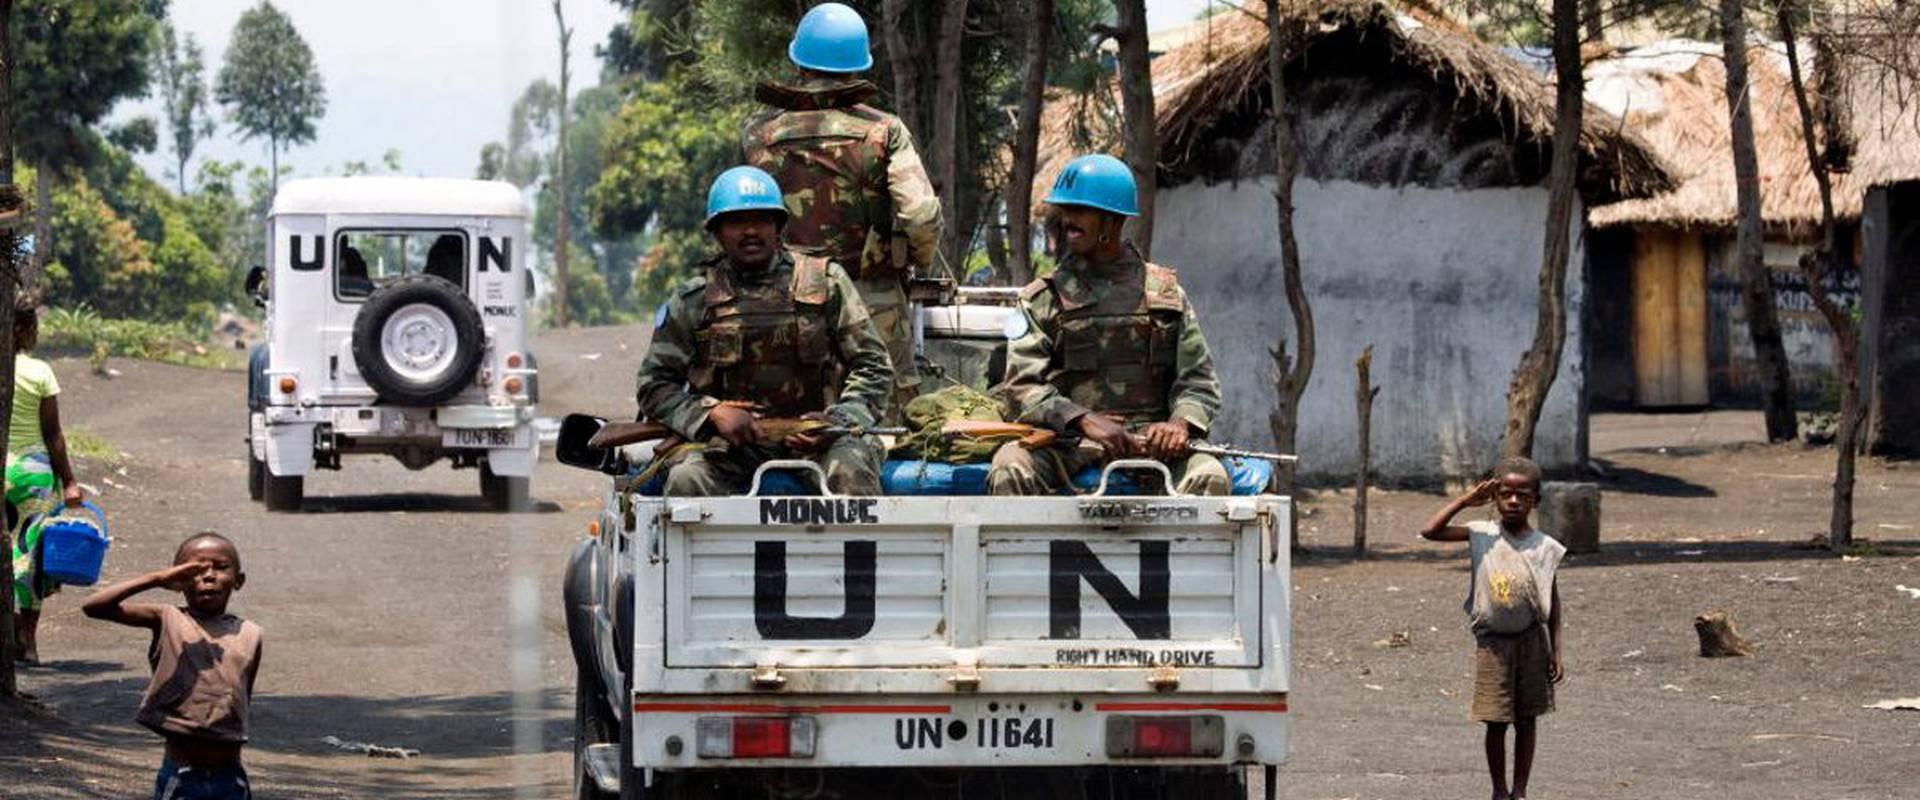 Prescribed 1 peacemaking and peacekeeping international